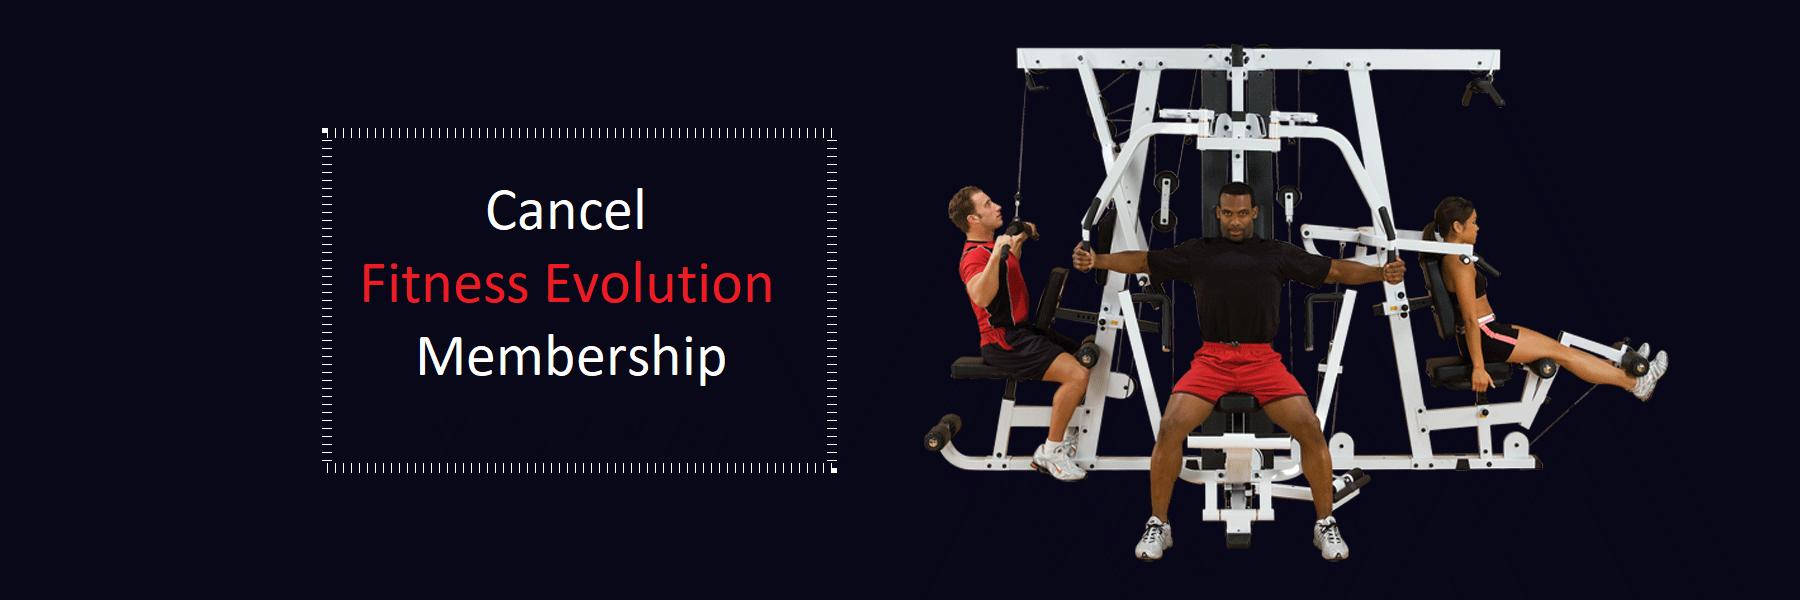 Cancel Fitness Evolution Membership